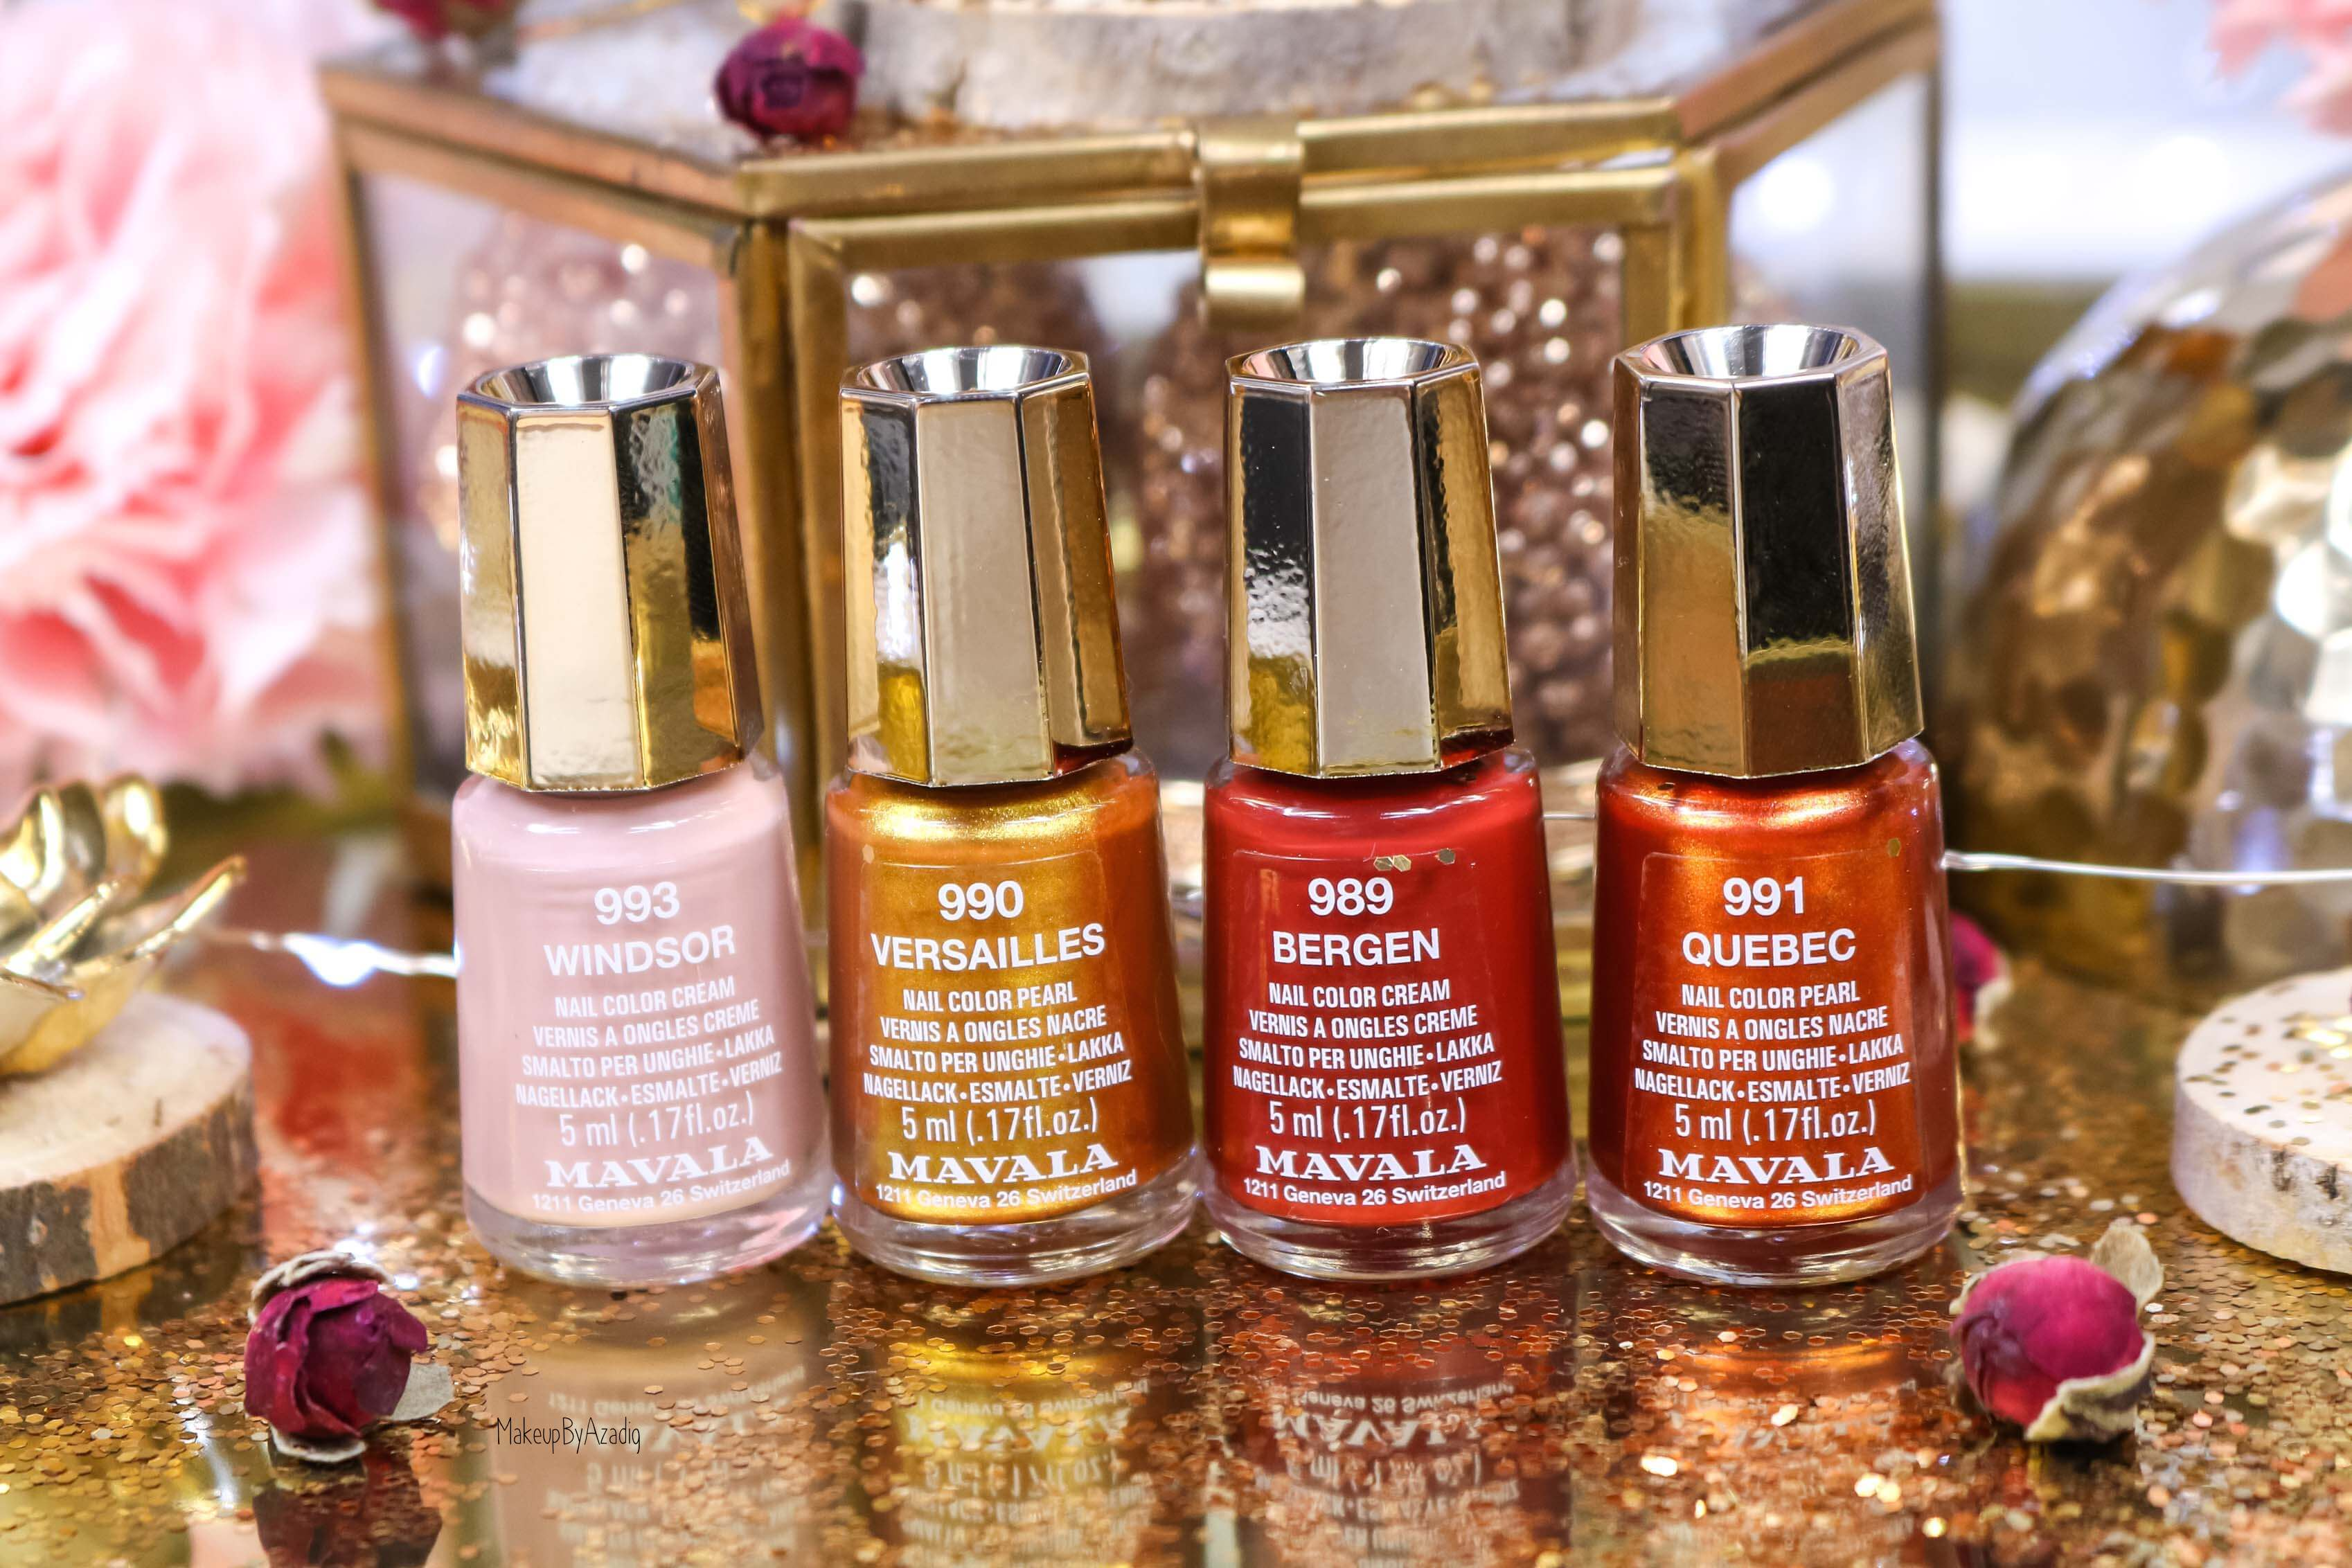 revue-collection-vernis-nails-heritage-chic-bordeaux-cuivre-metallique-gold-rouge-makeupbyazadig-swatch-avis-prix-parapharmacie